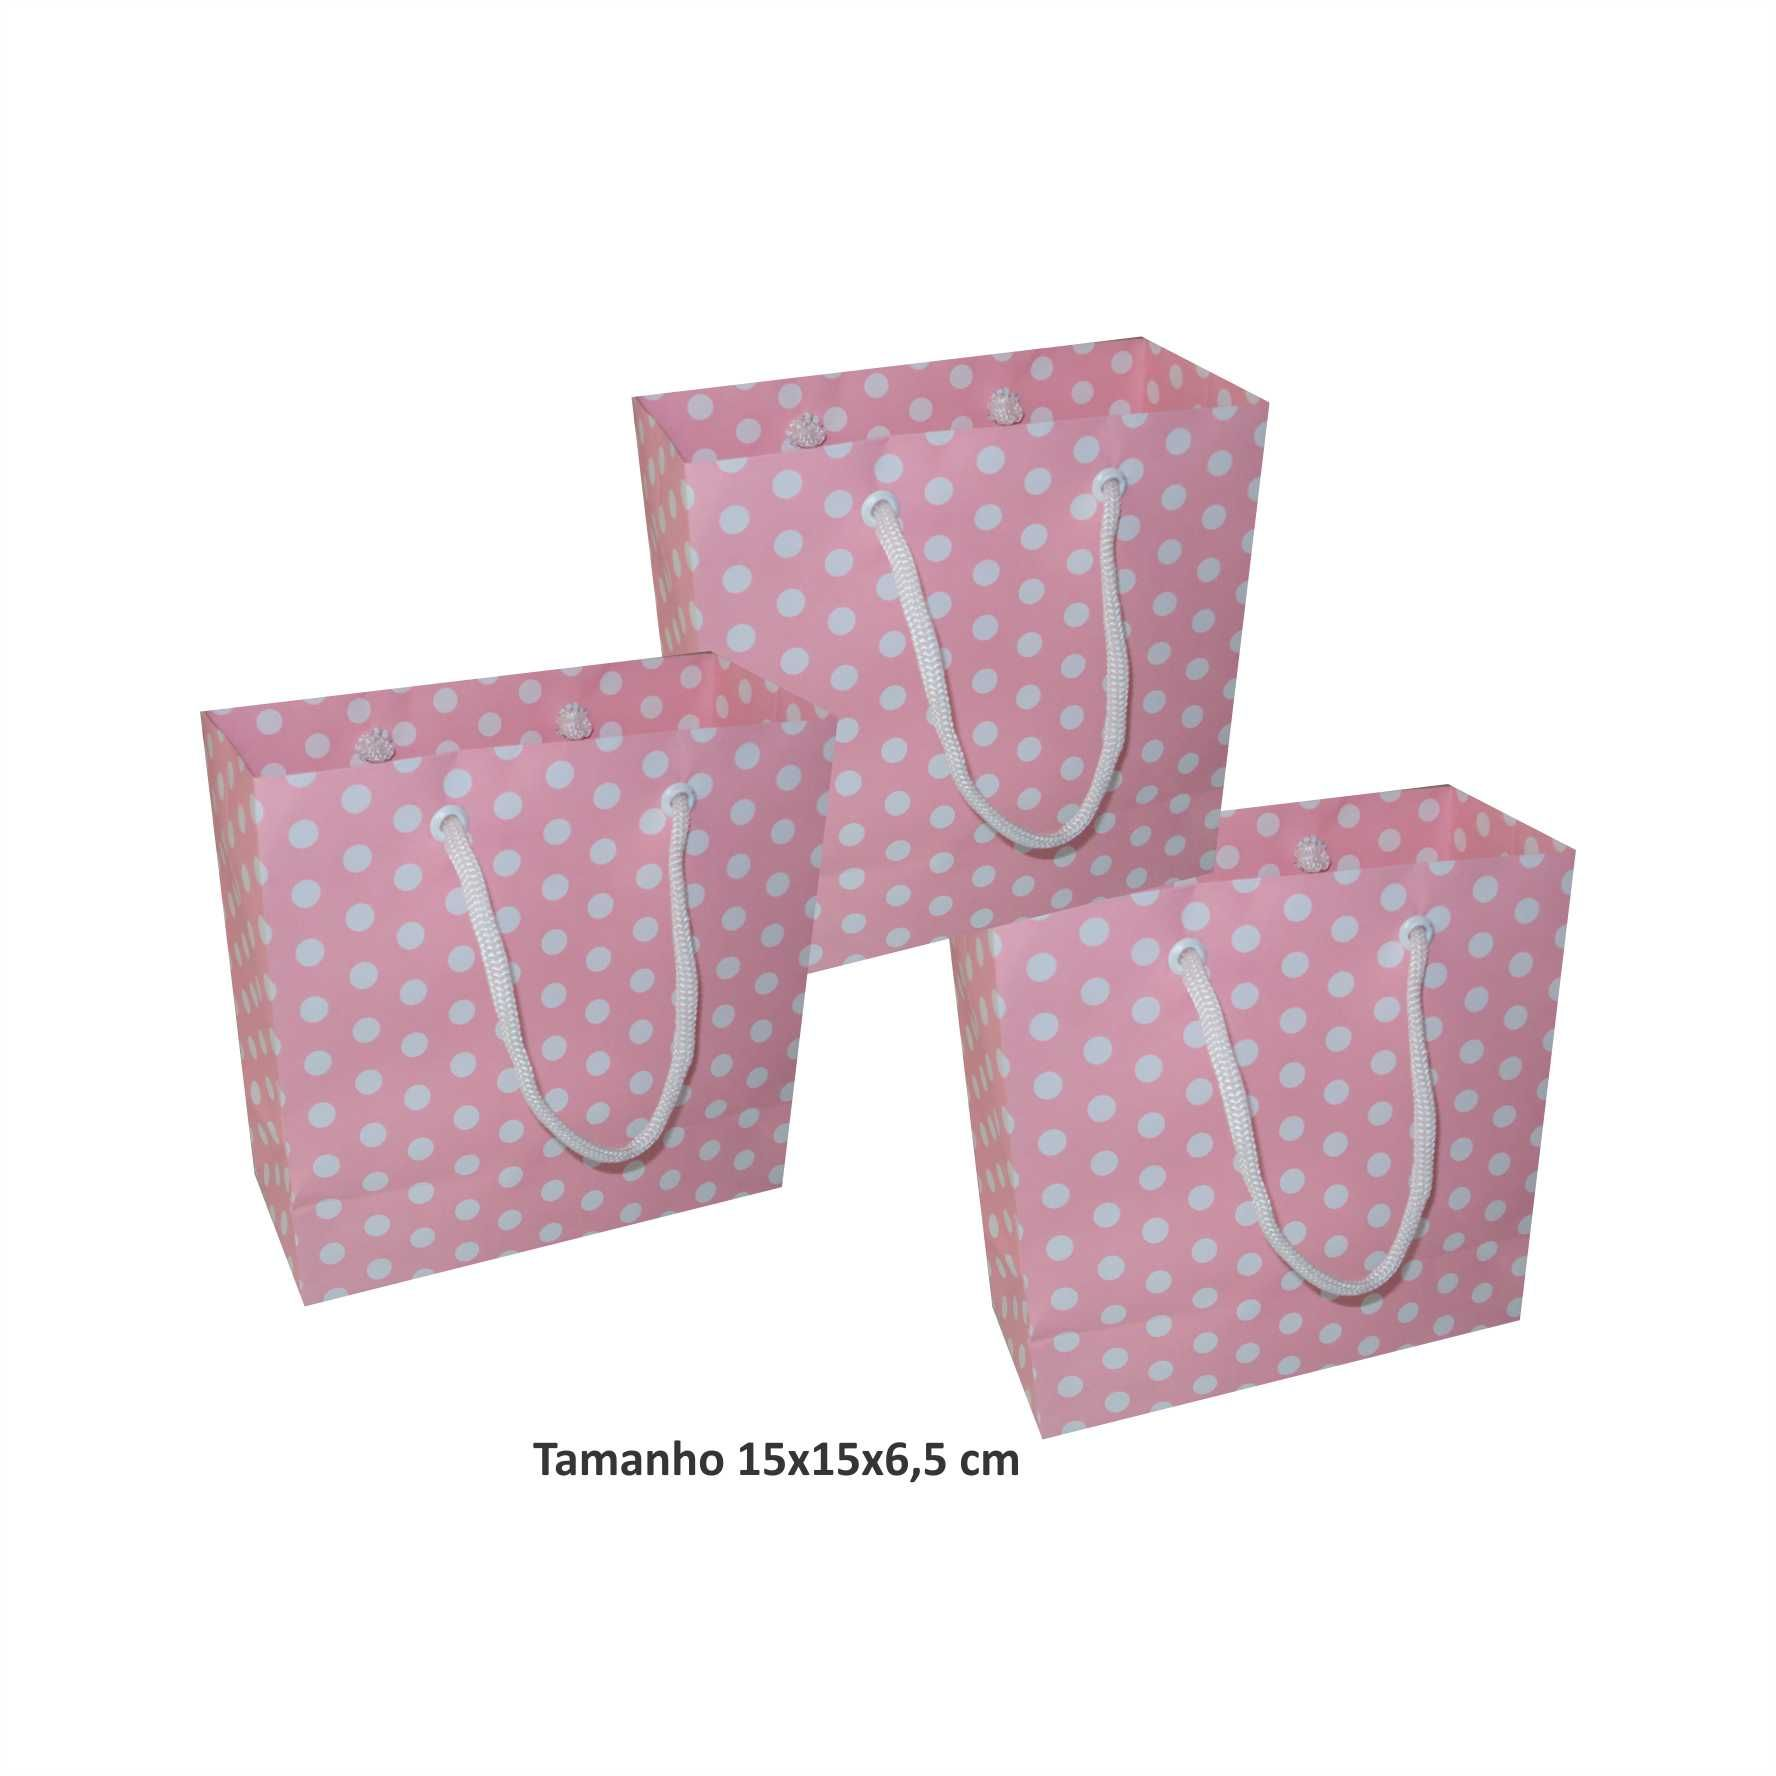 Sacola de papel Pequena (15x15x6,5 cm) rosa de bolinha branca - 10 unidades